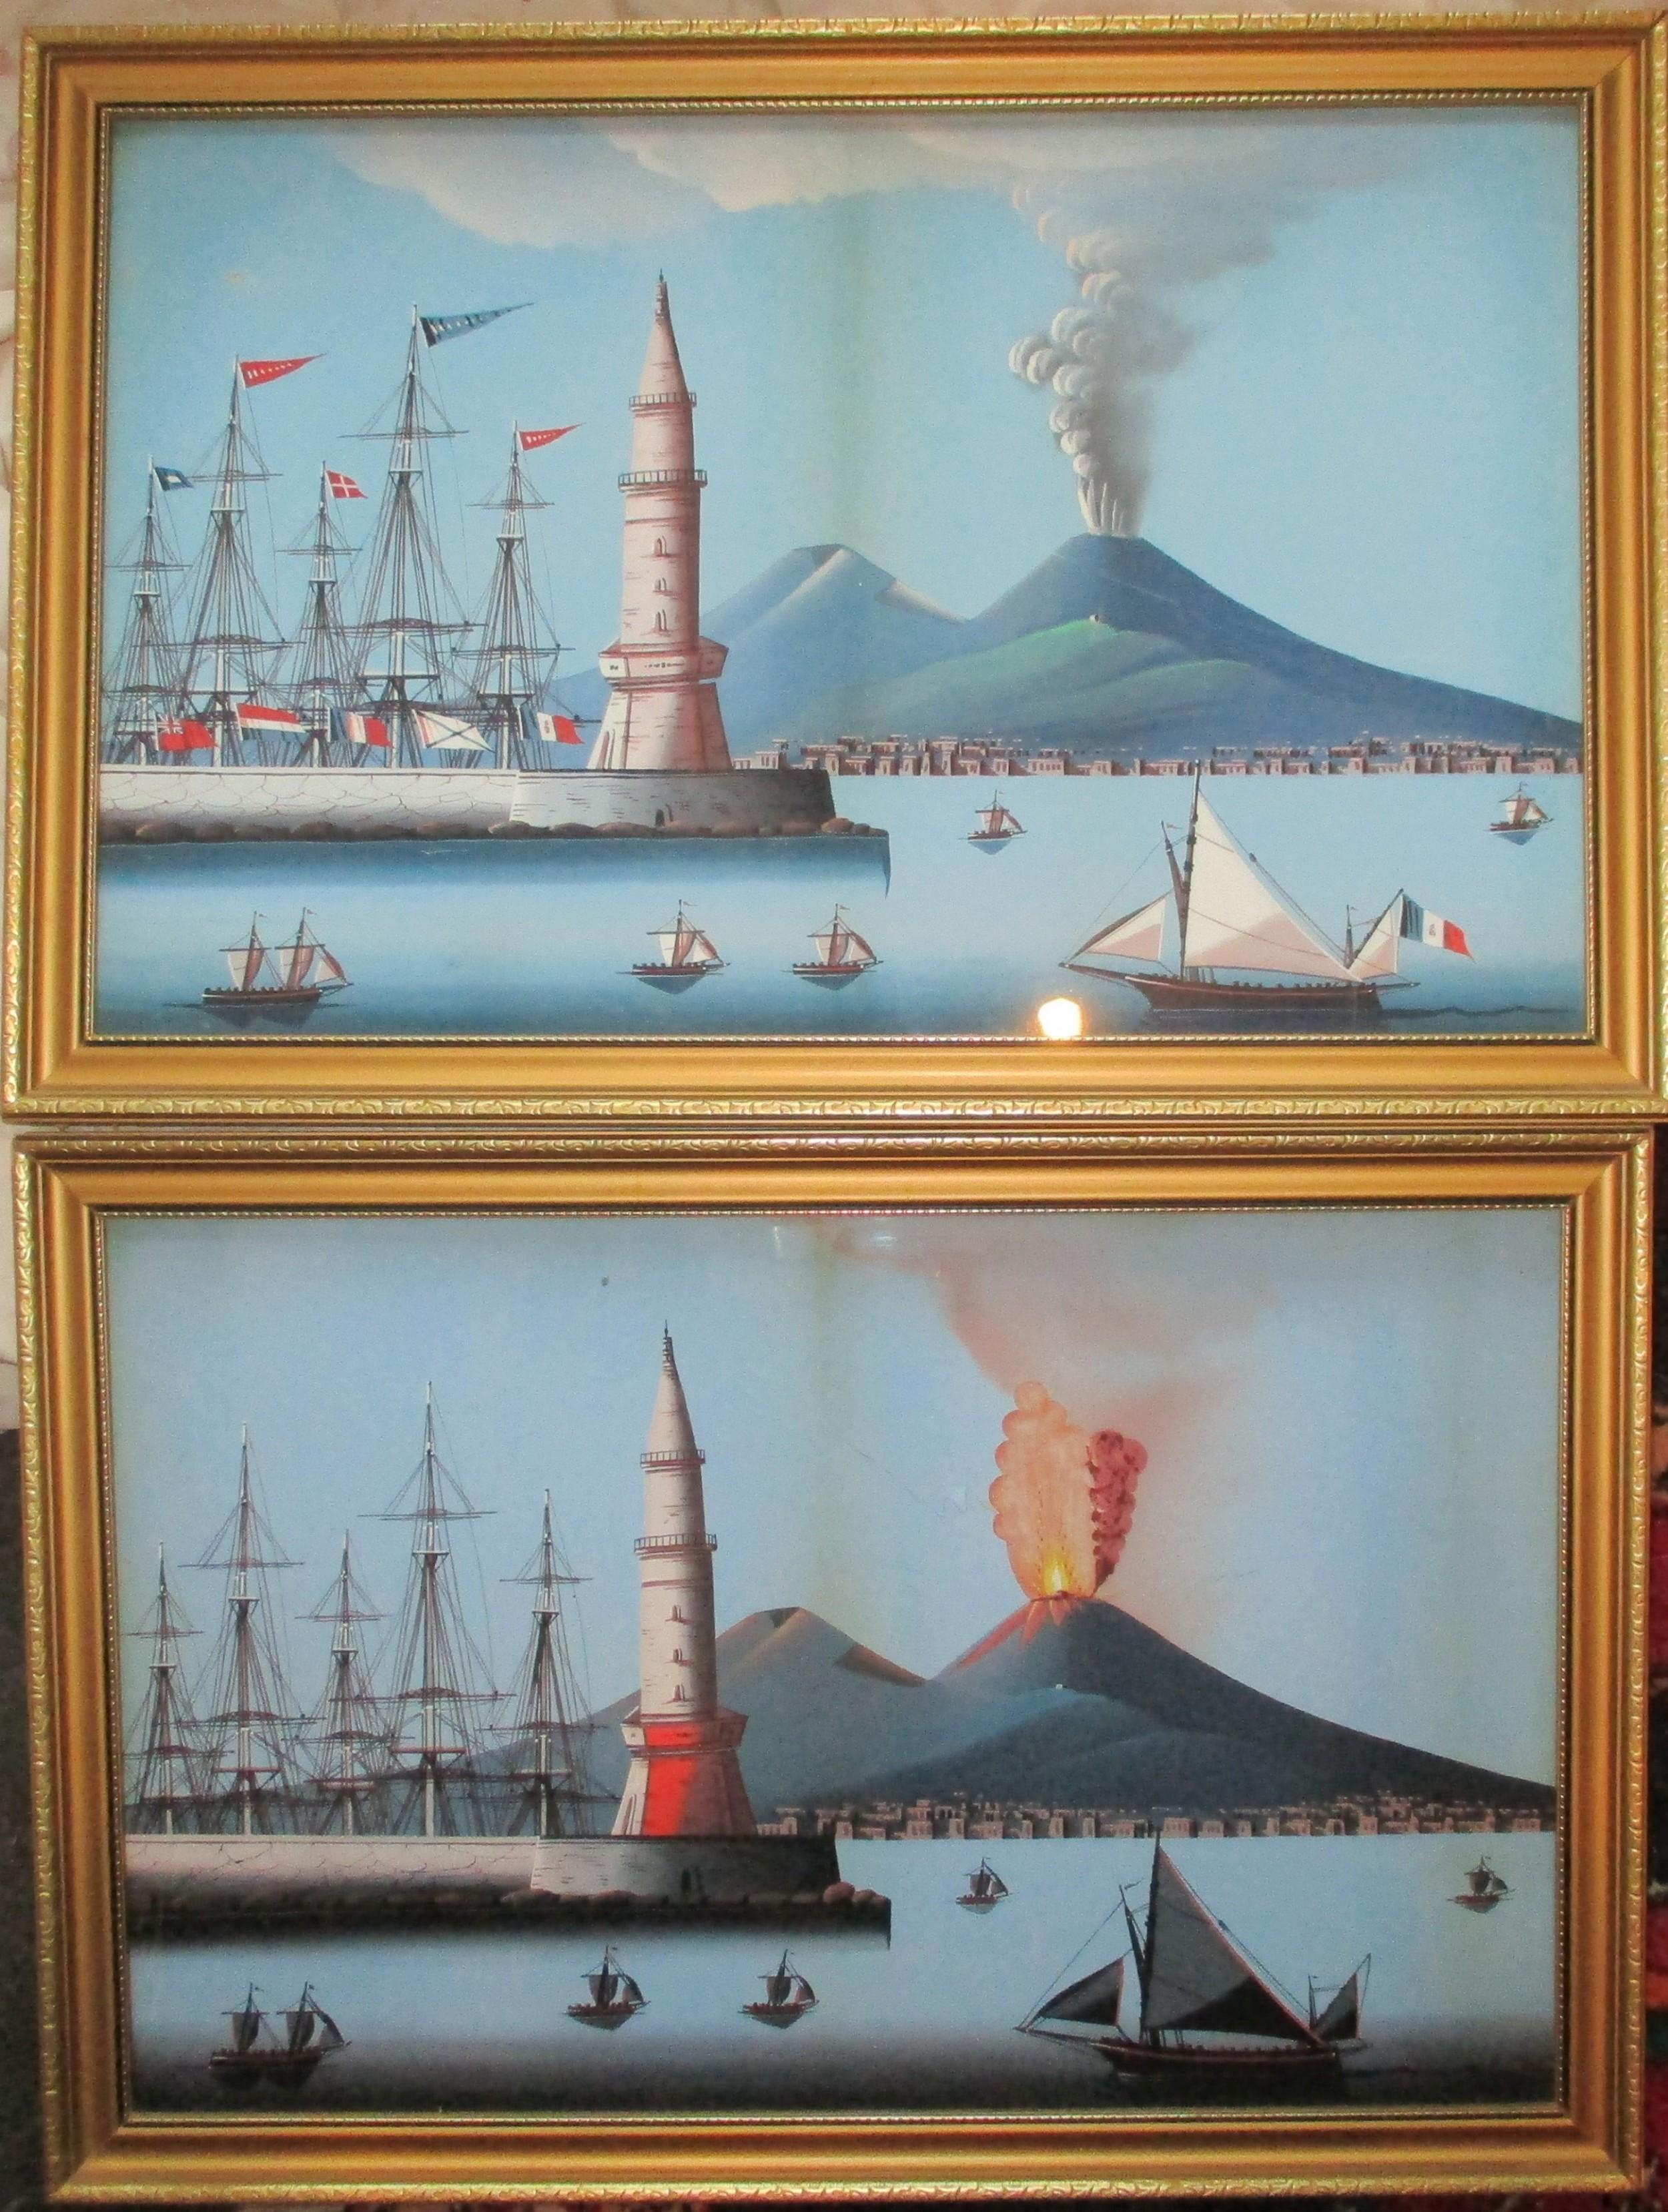 c19th century neapolitan bay of naples paintings guache